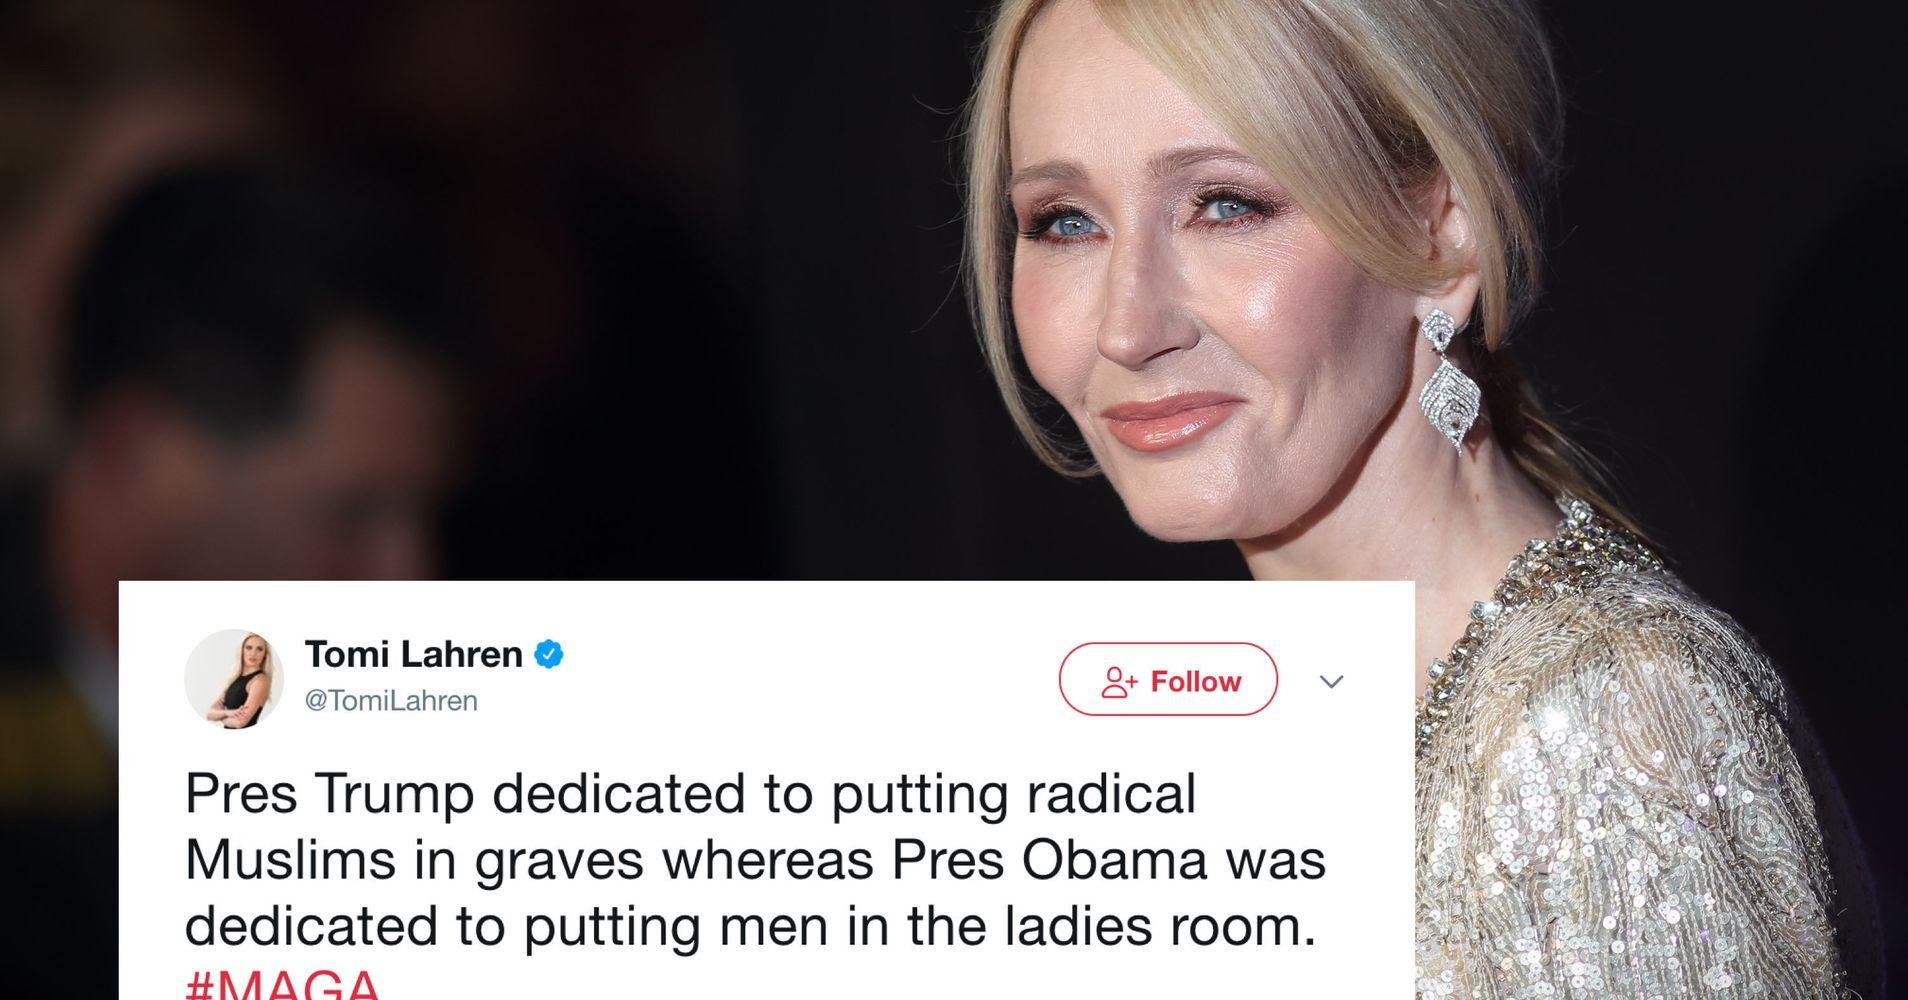 Tomi Lahren Uses Trans Ban To Slam Obama. J.K. Rowling Wasn't Having It.